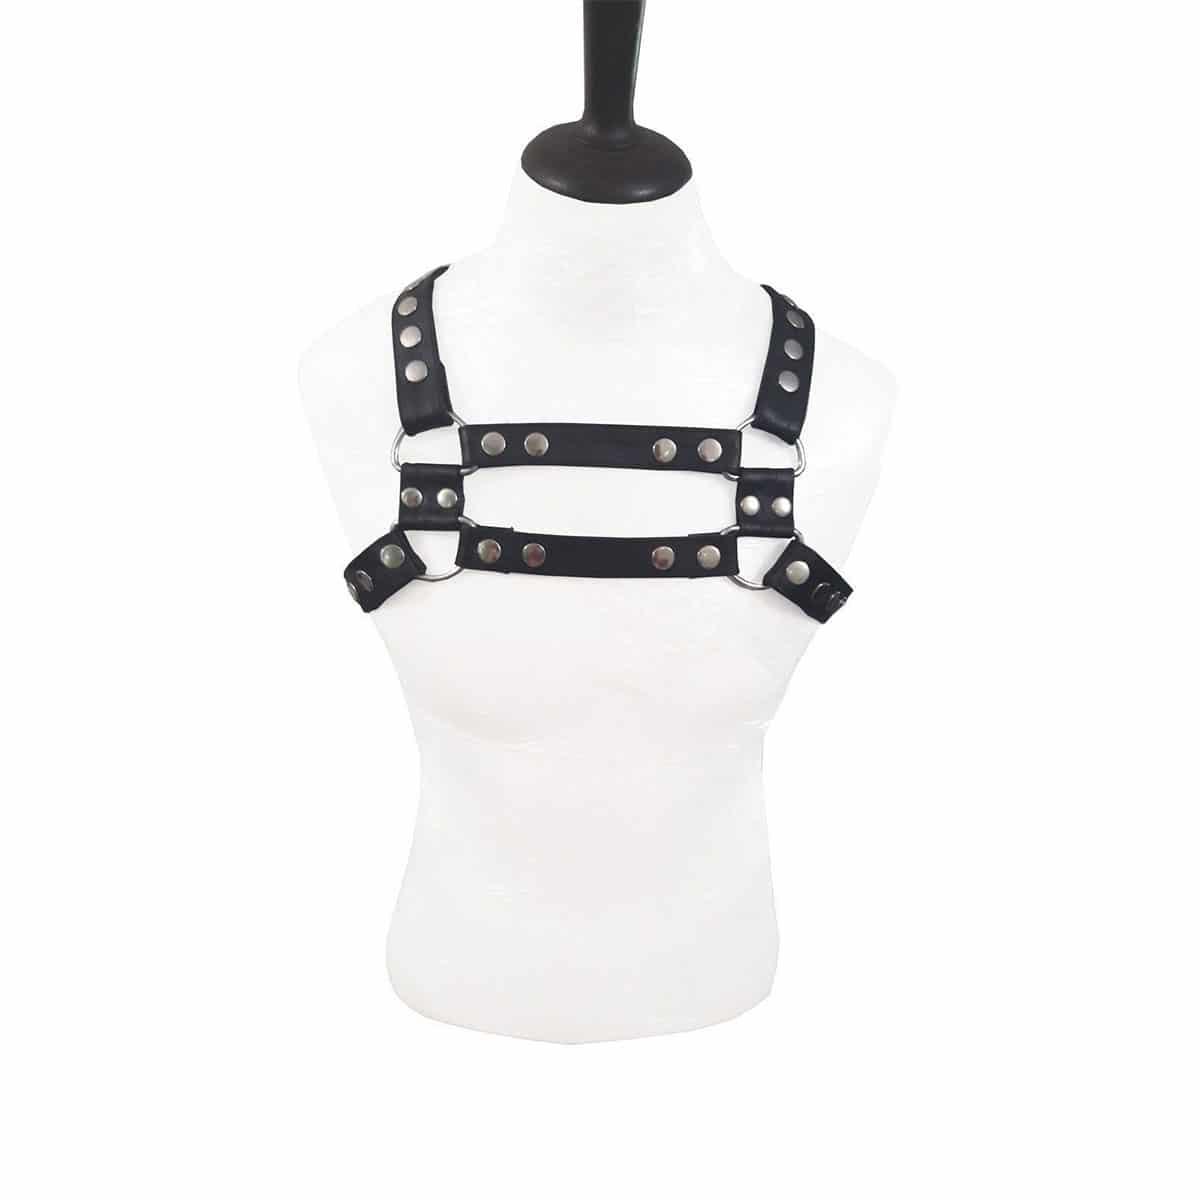 Mens bondage Male Harness Real BLACK Leather heavy duty LARP